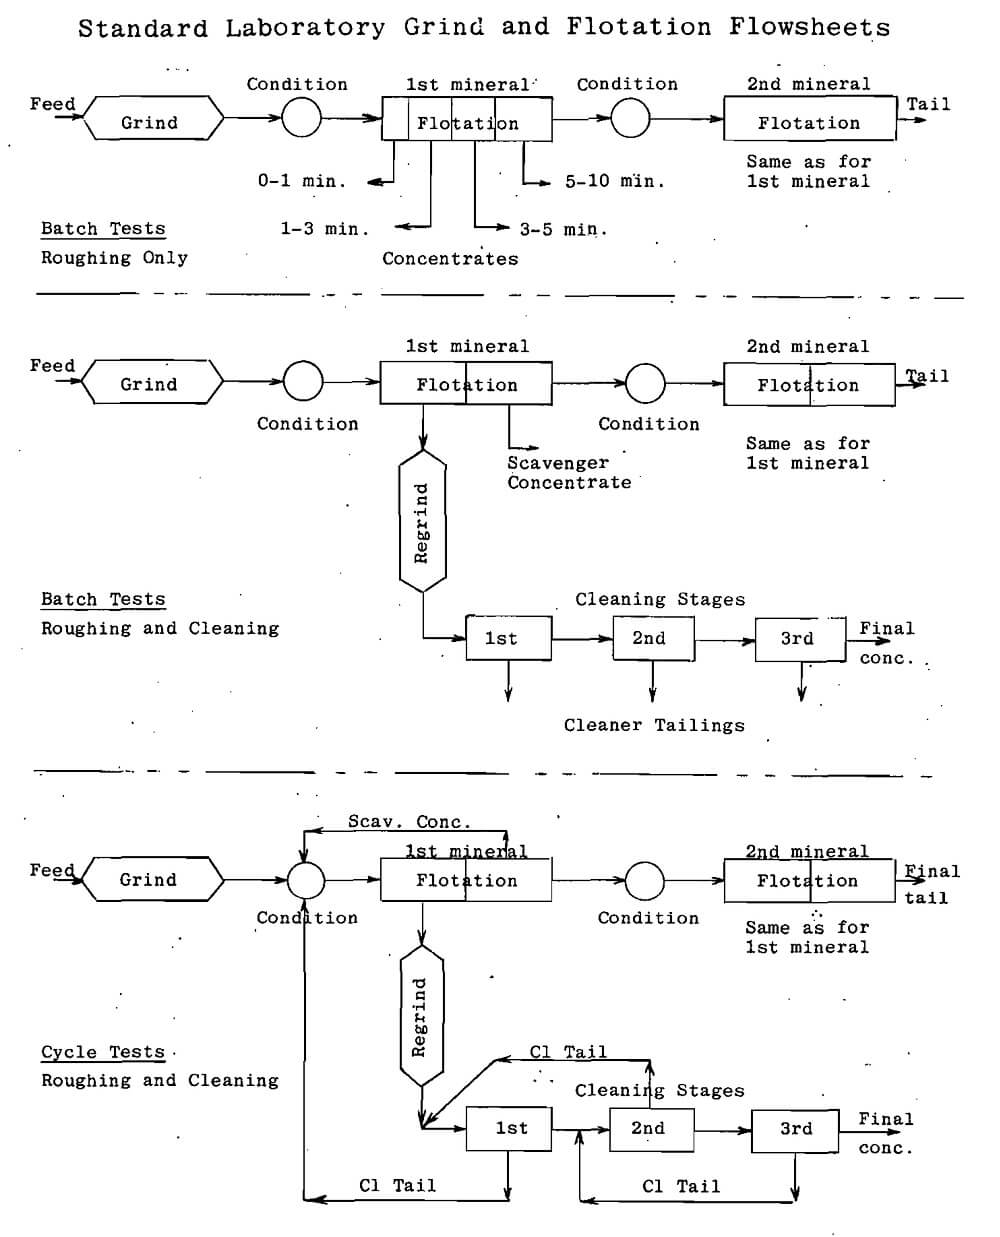 standard-laboratory-grind-and-flotation-flowsheet